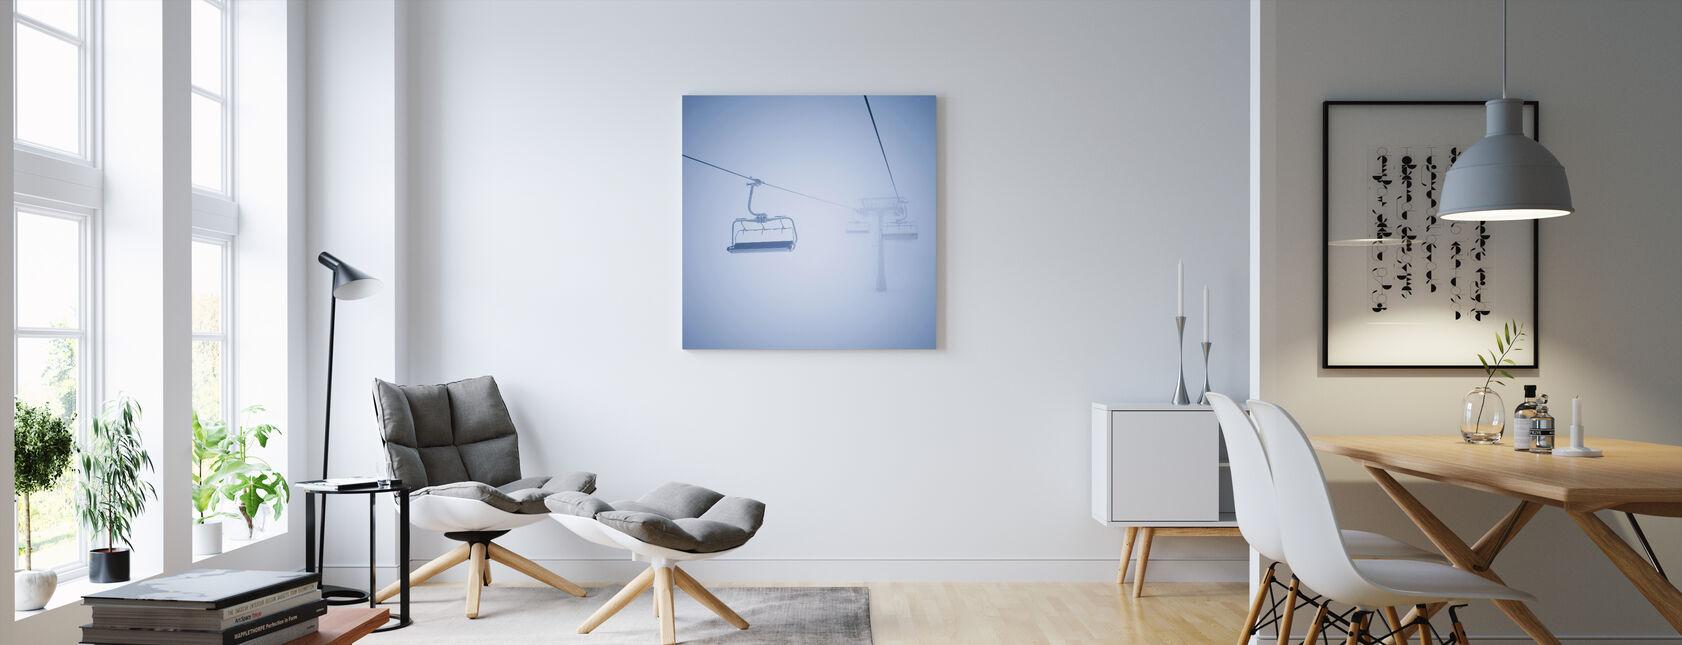 Ski Lifts - Canvas print - Living Room